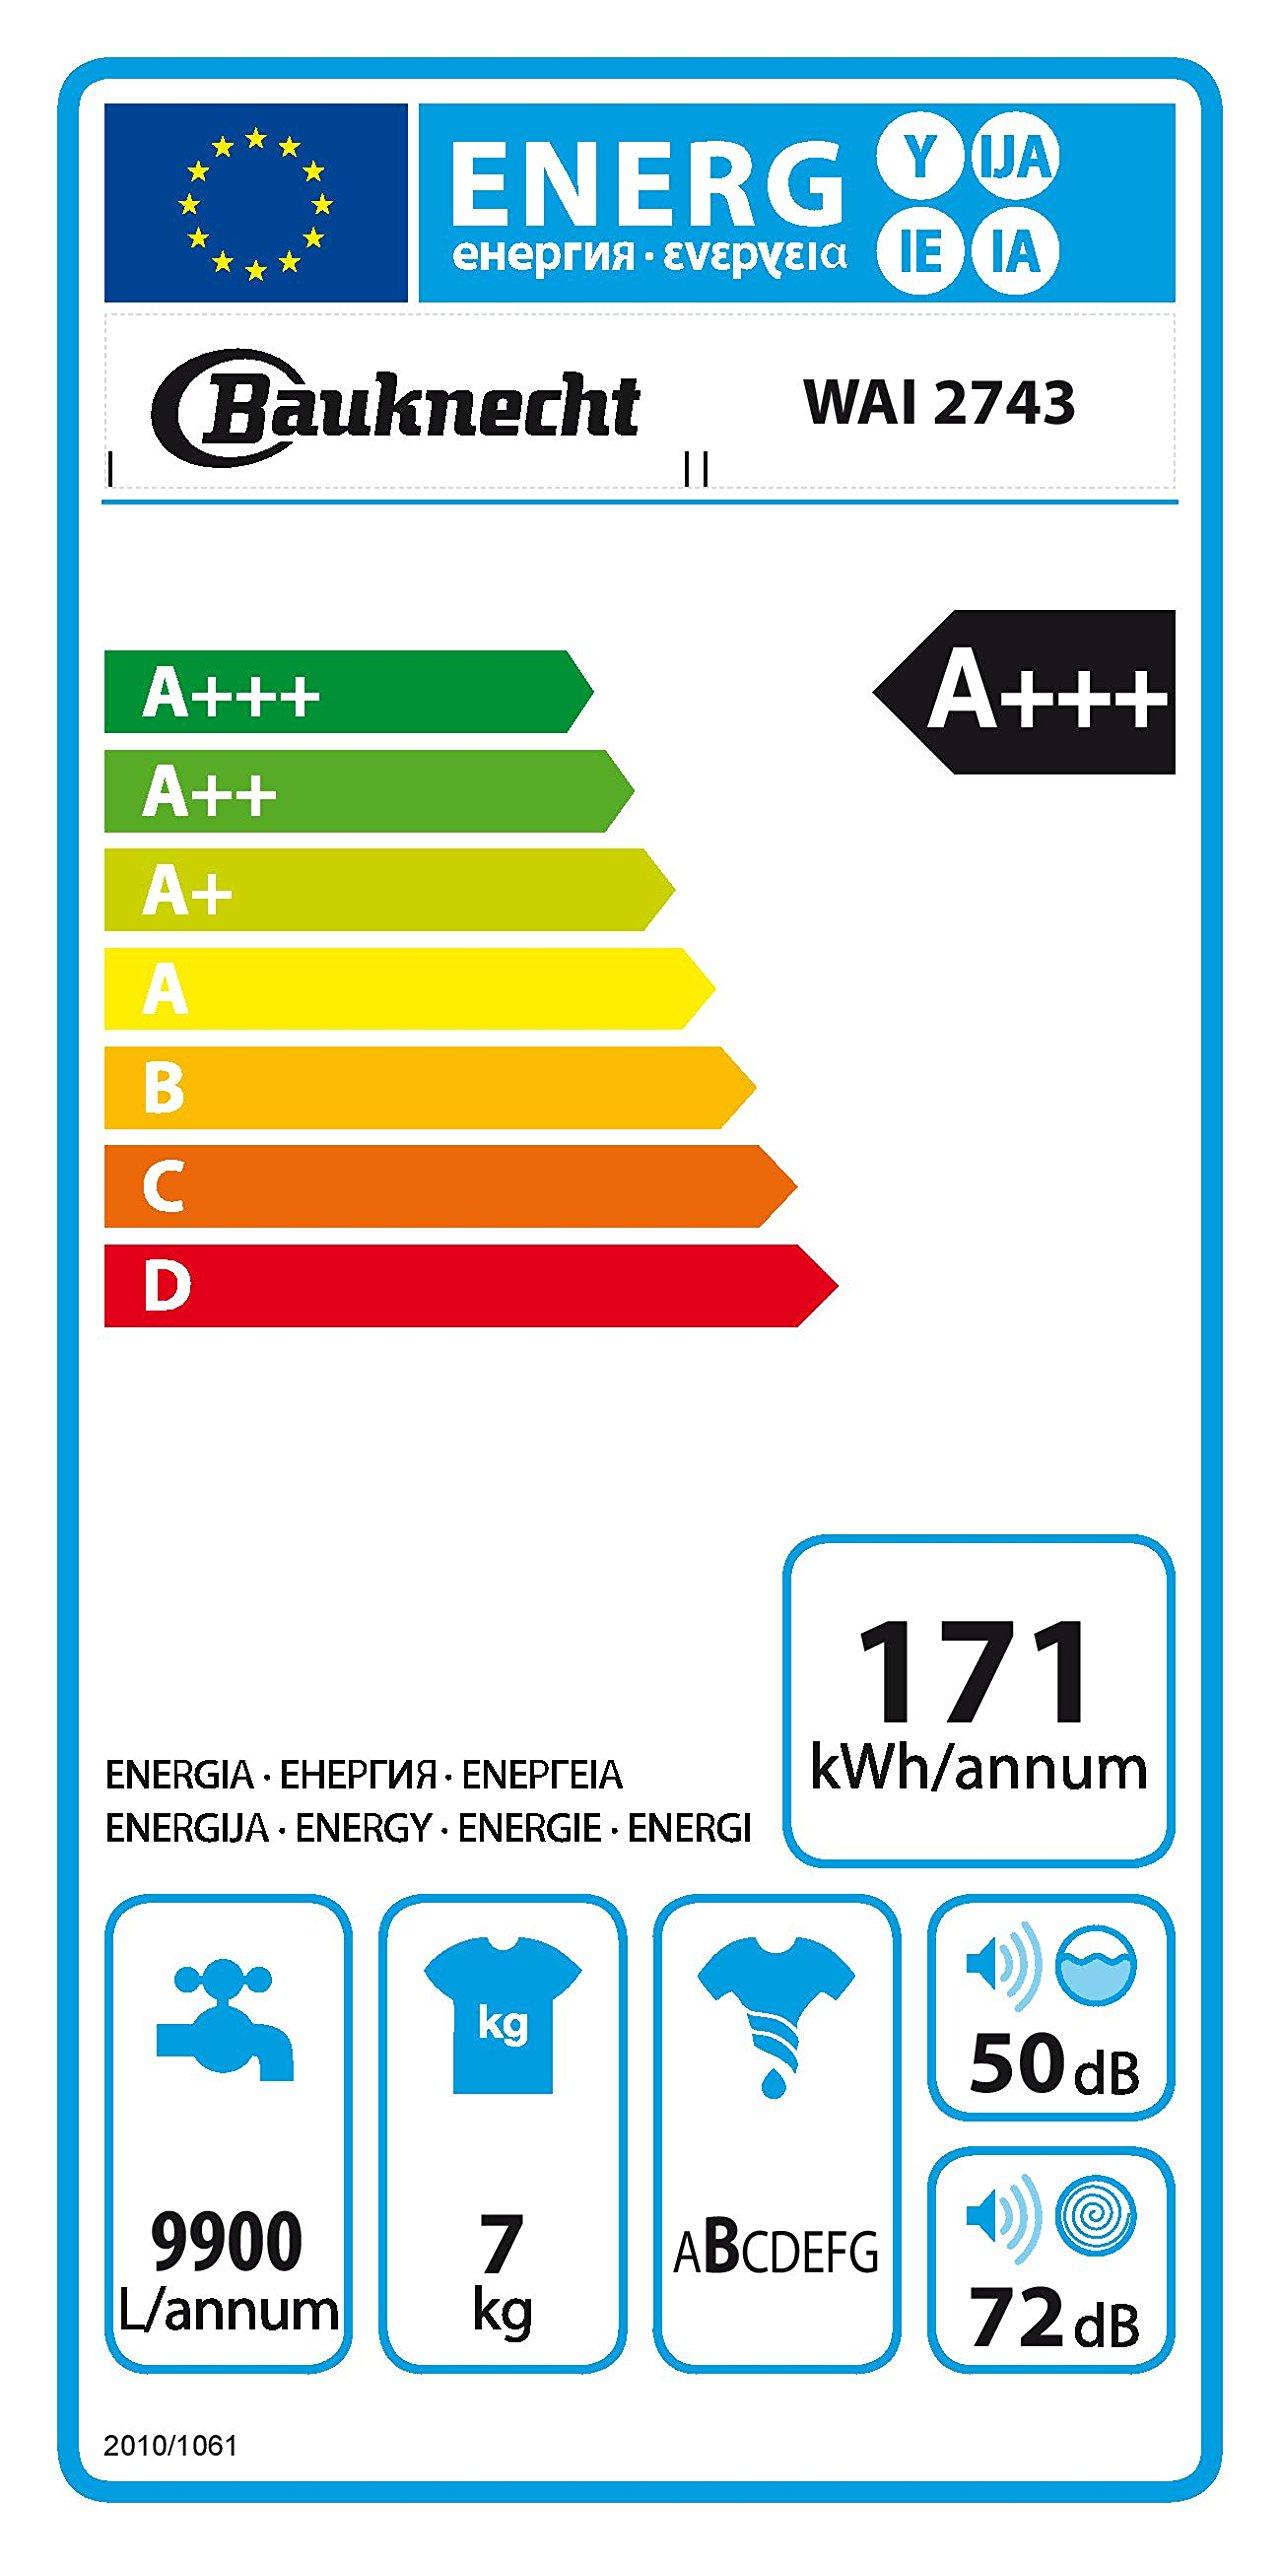 Bauknecht-WAI-2743-Waschmaschine-EinbauA171kWhJahr-7-LEcoMonitorFertig-inwei